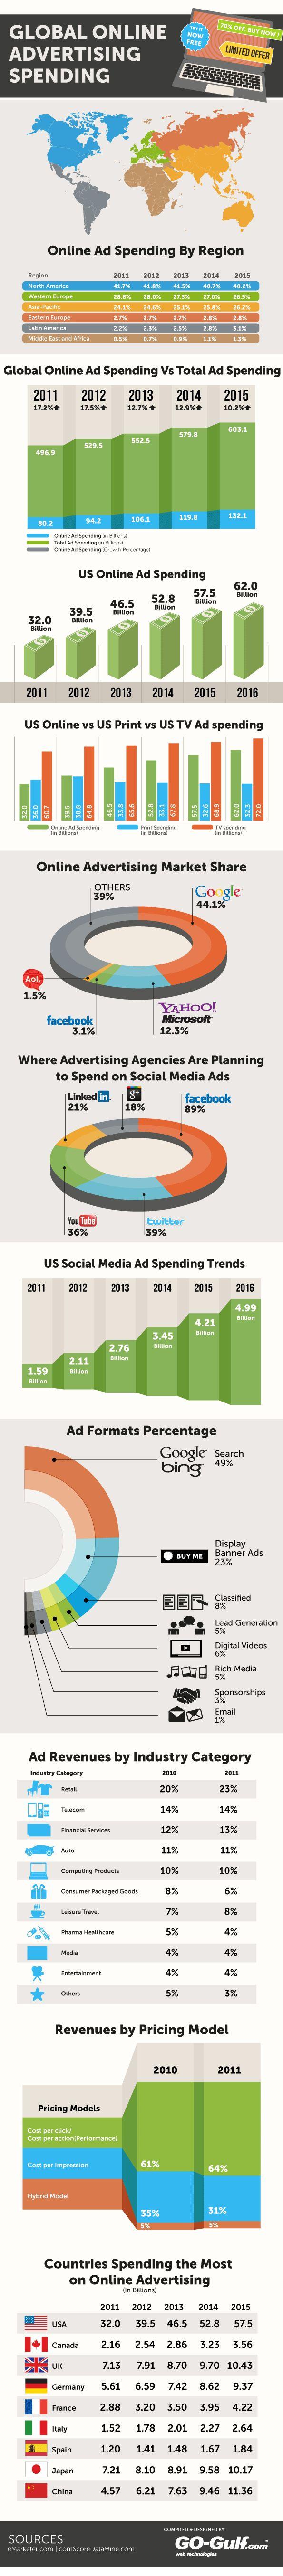 http://www.pamorama.net/2012/05/20/15-informative-2012-marketing-infographics/